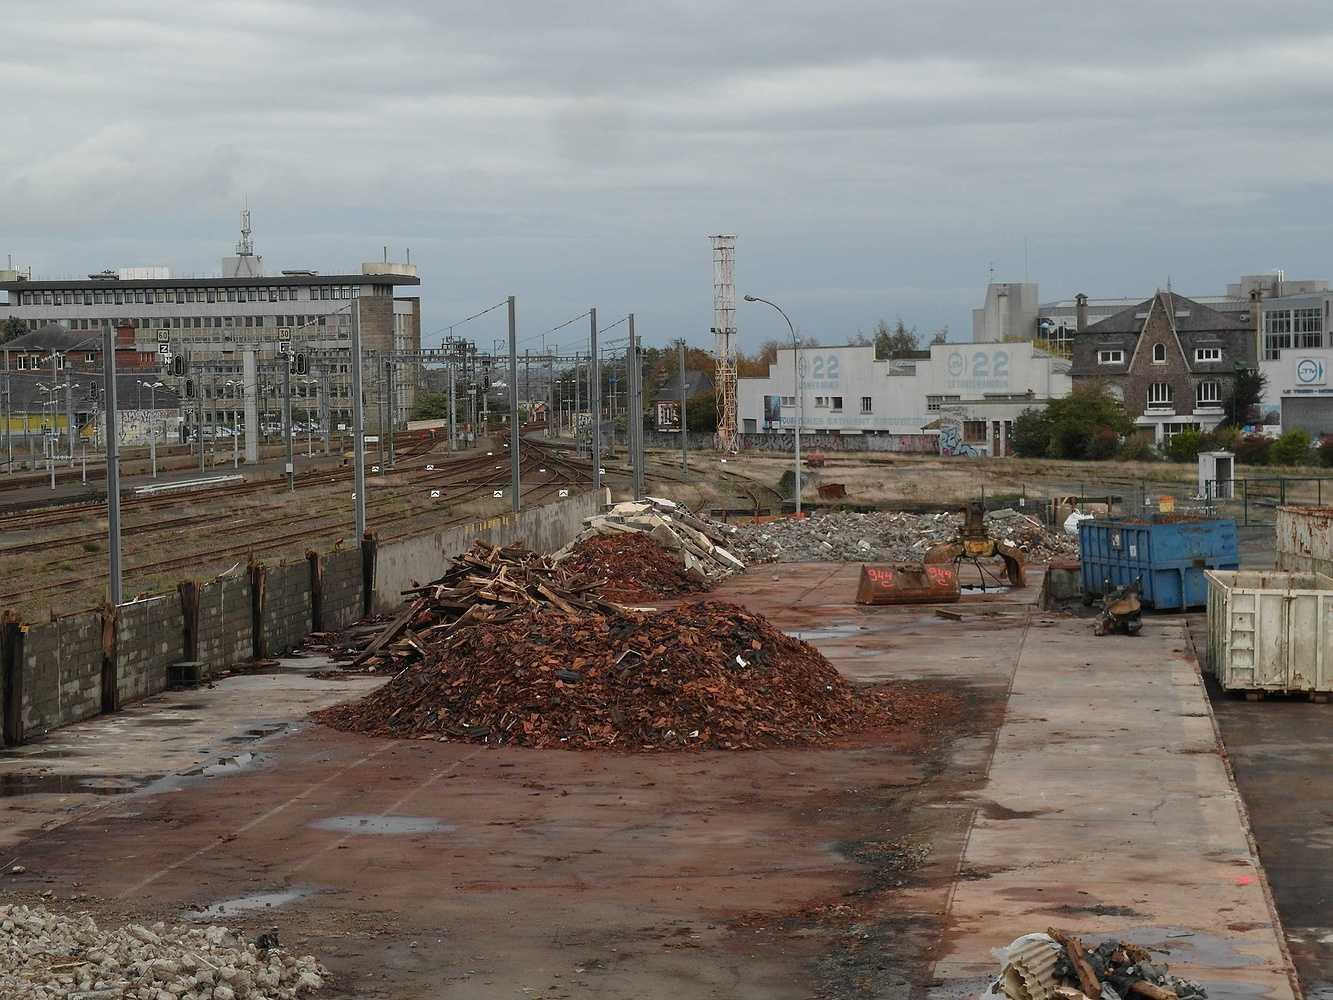 Les travaux continuent sud gare 2014 sam5144